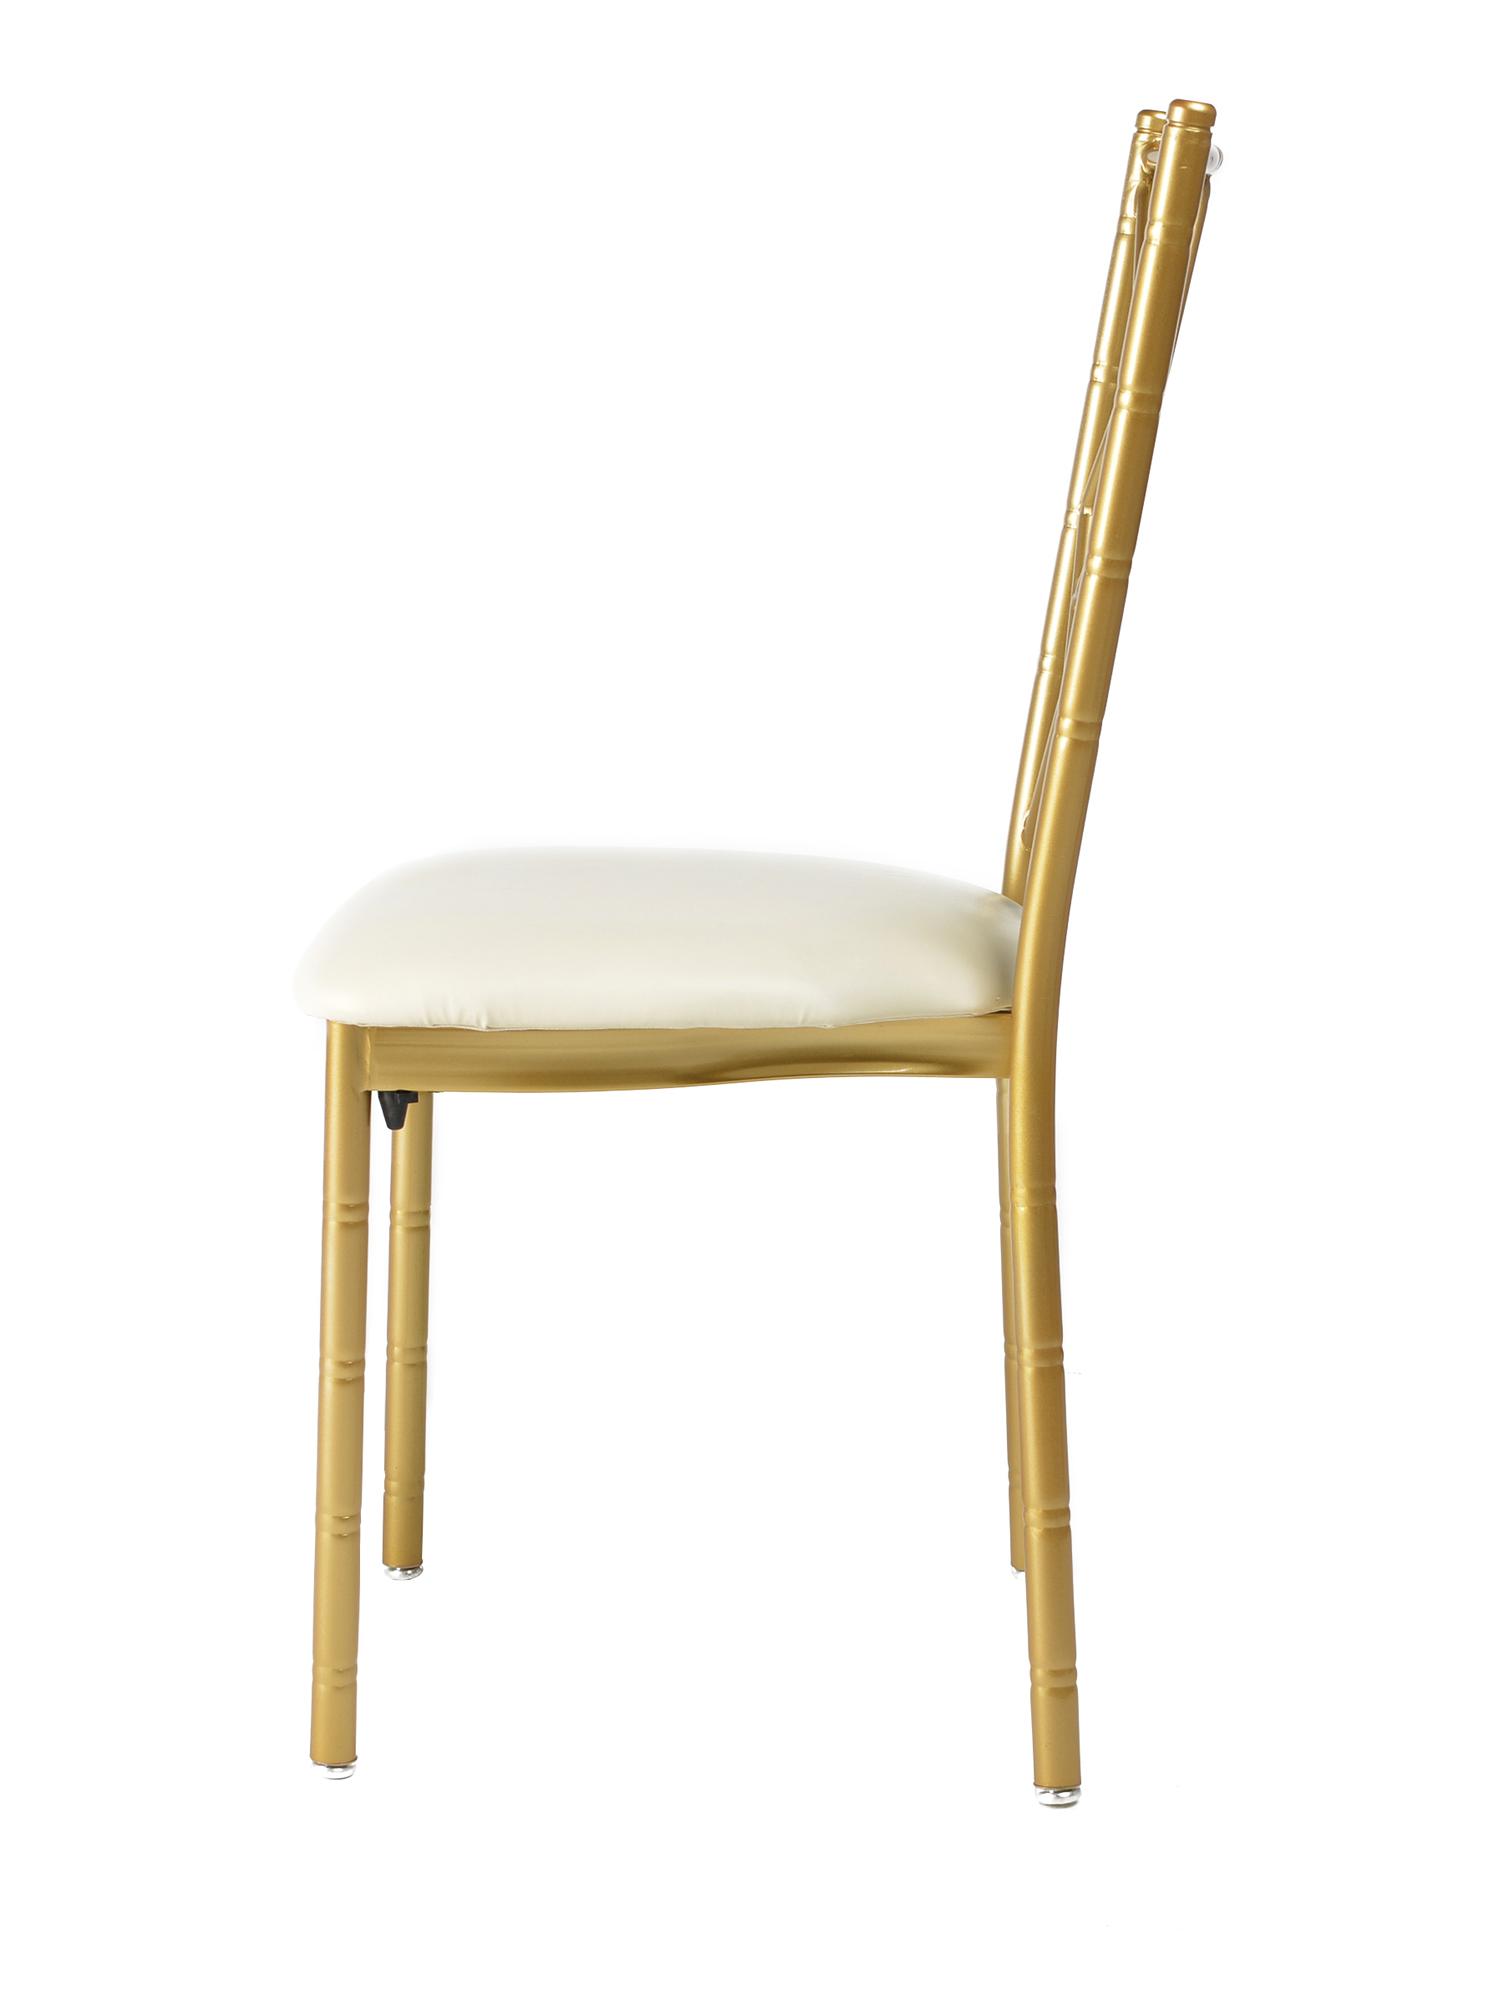 chair covers rose gold shower disabled metal ballroom chiavari  csp